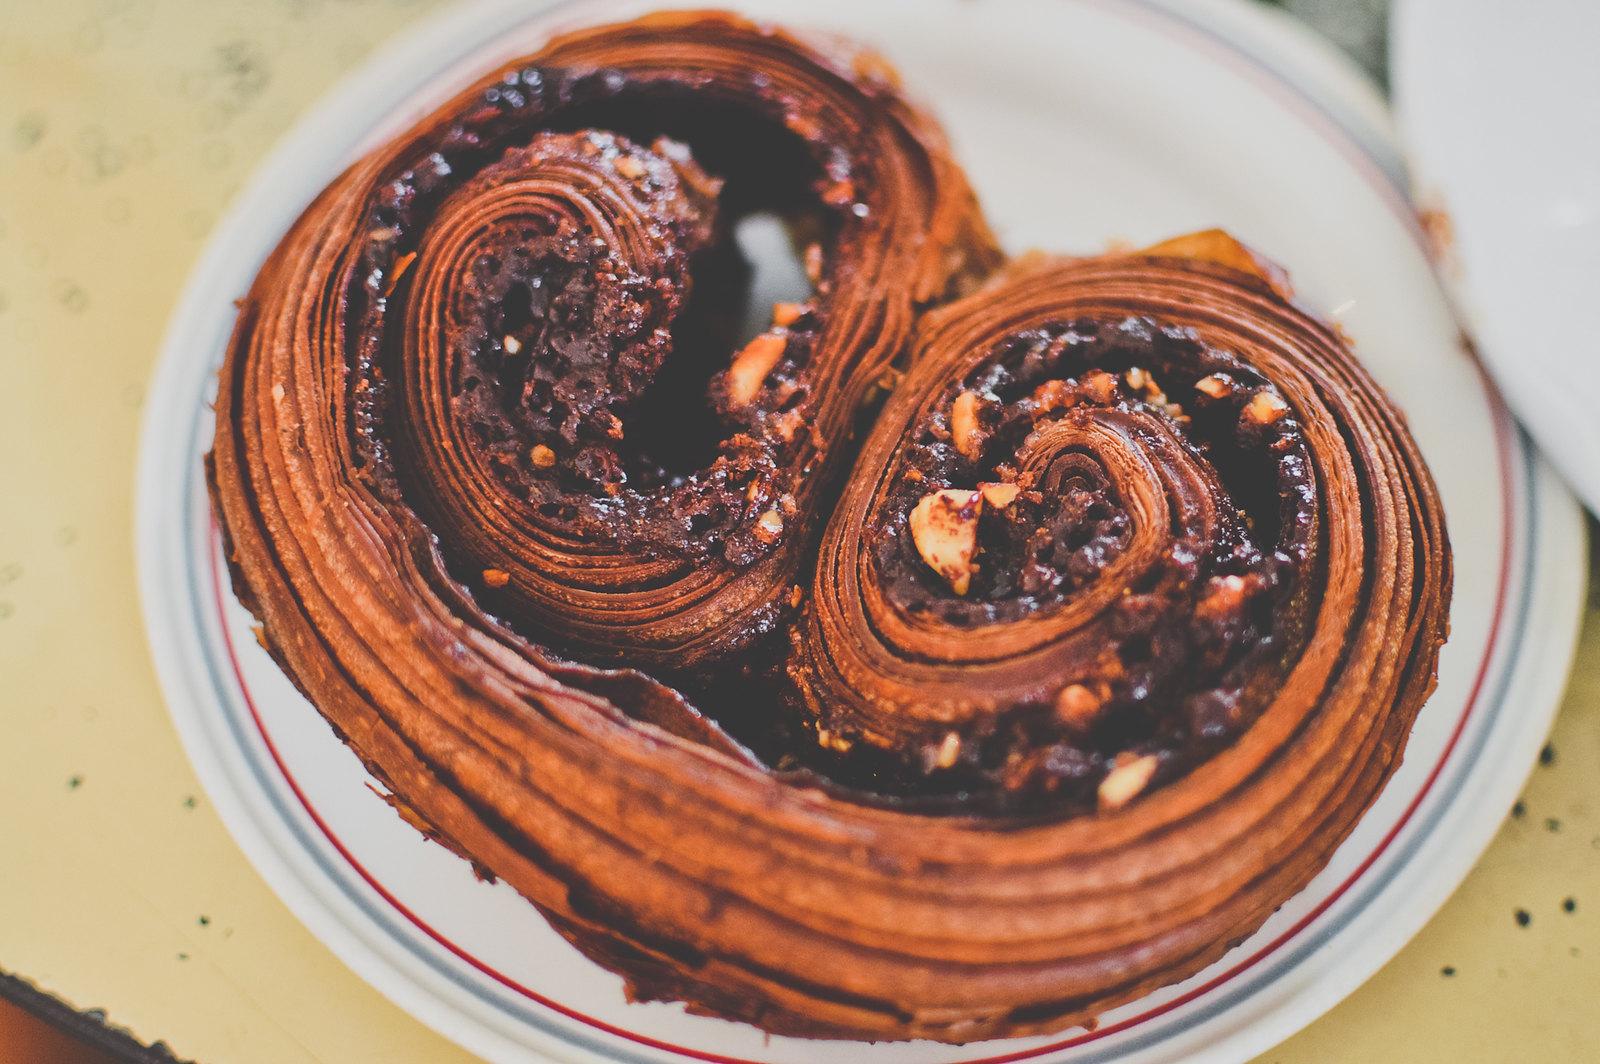 Tiong Bahru Bakery Chocolate Kouign Amann